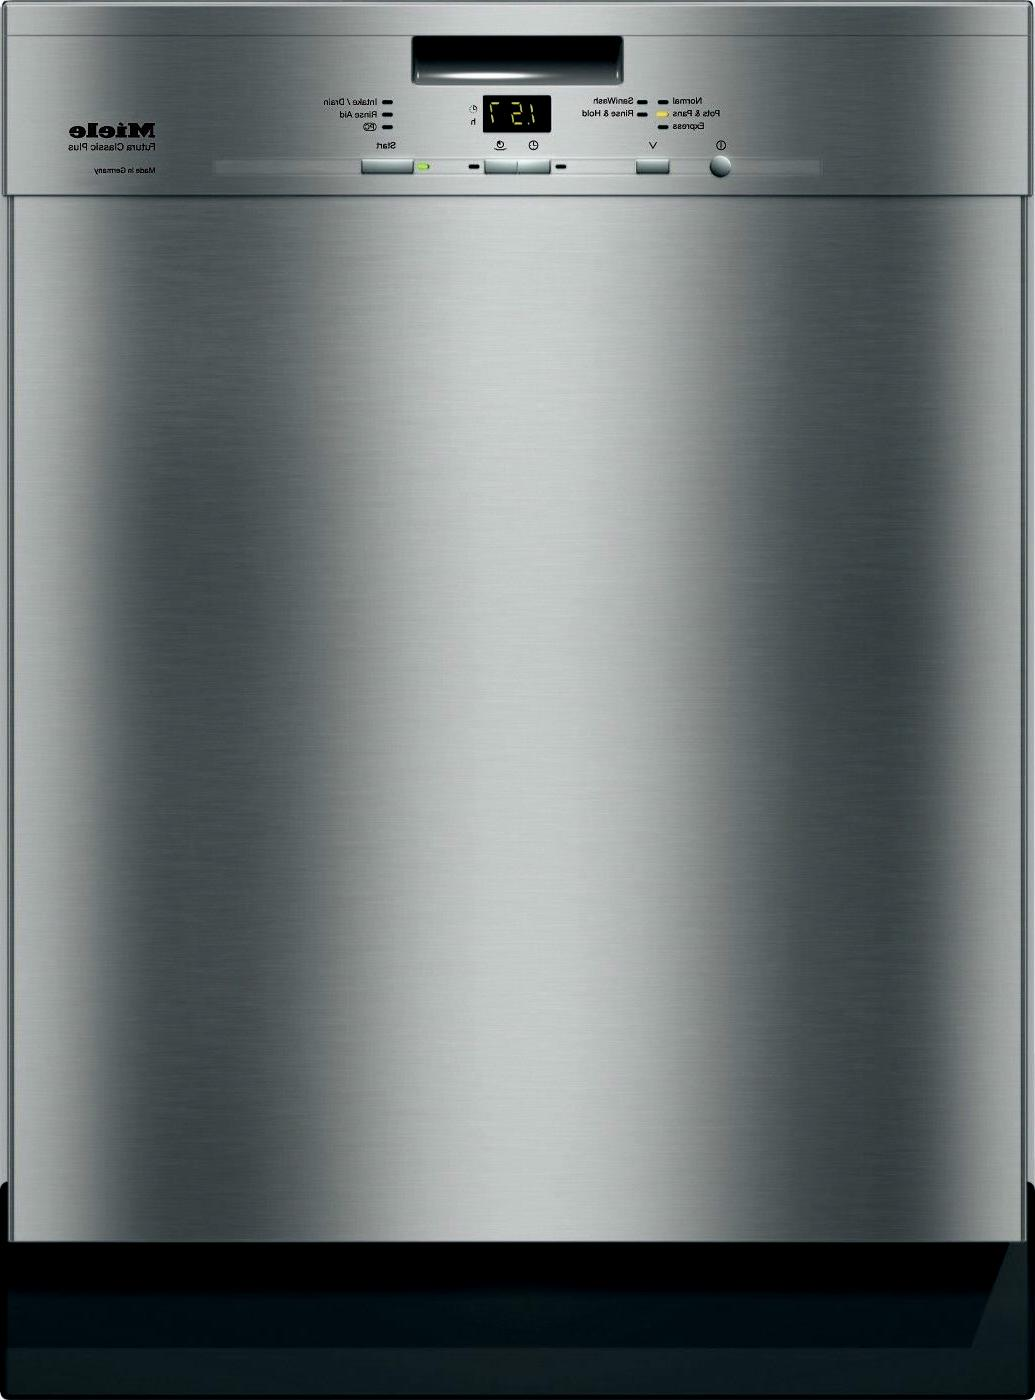 g4925uss classic plus full console dishwasher in